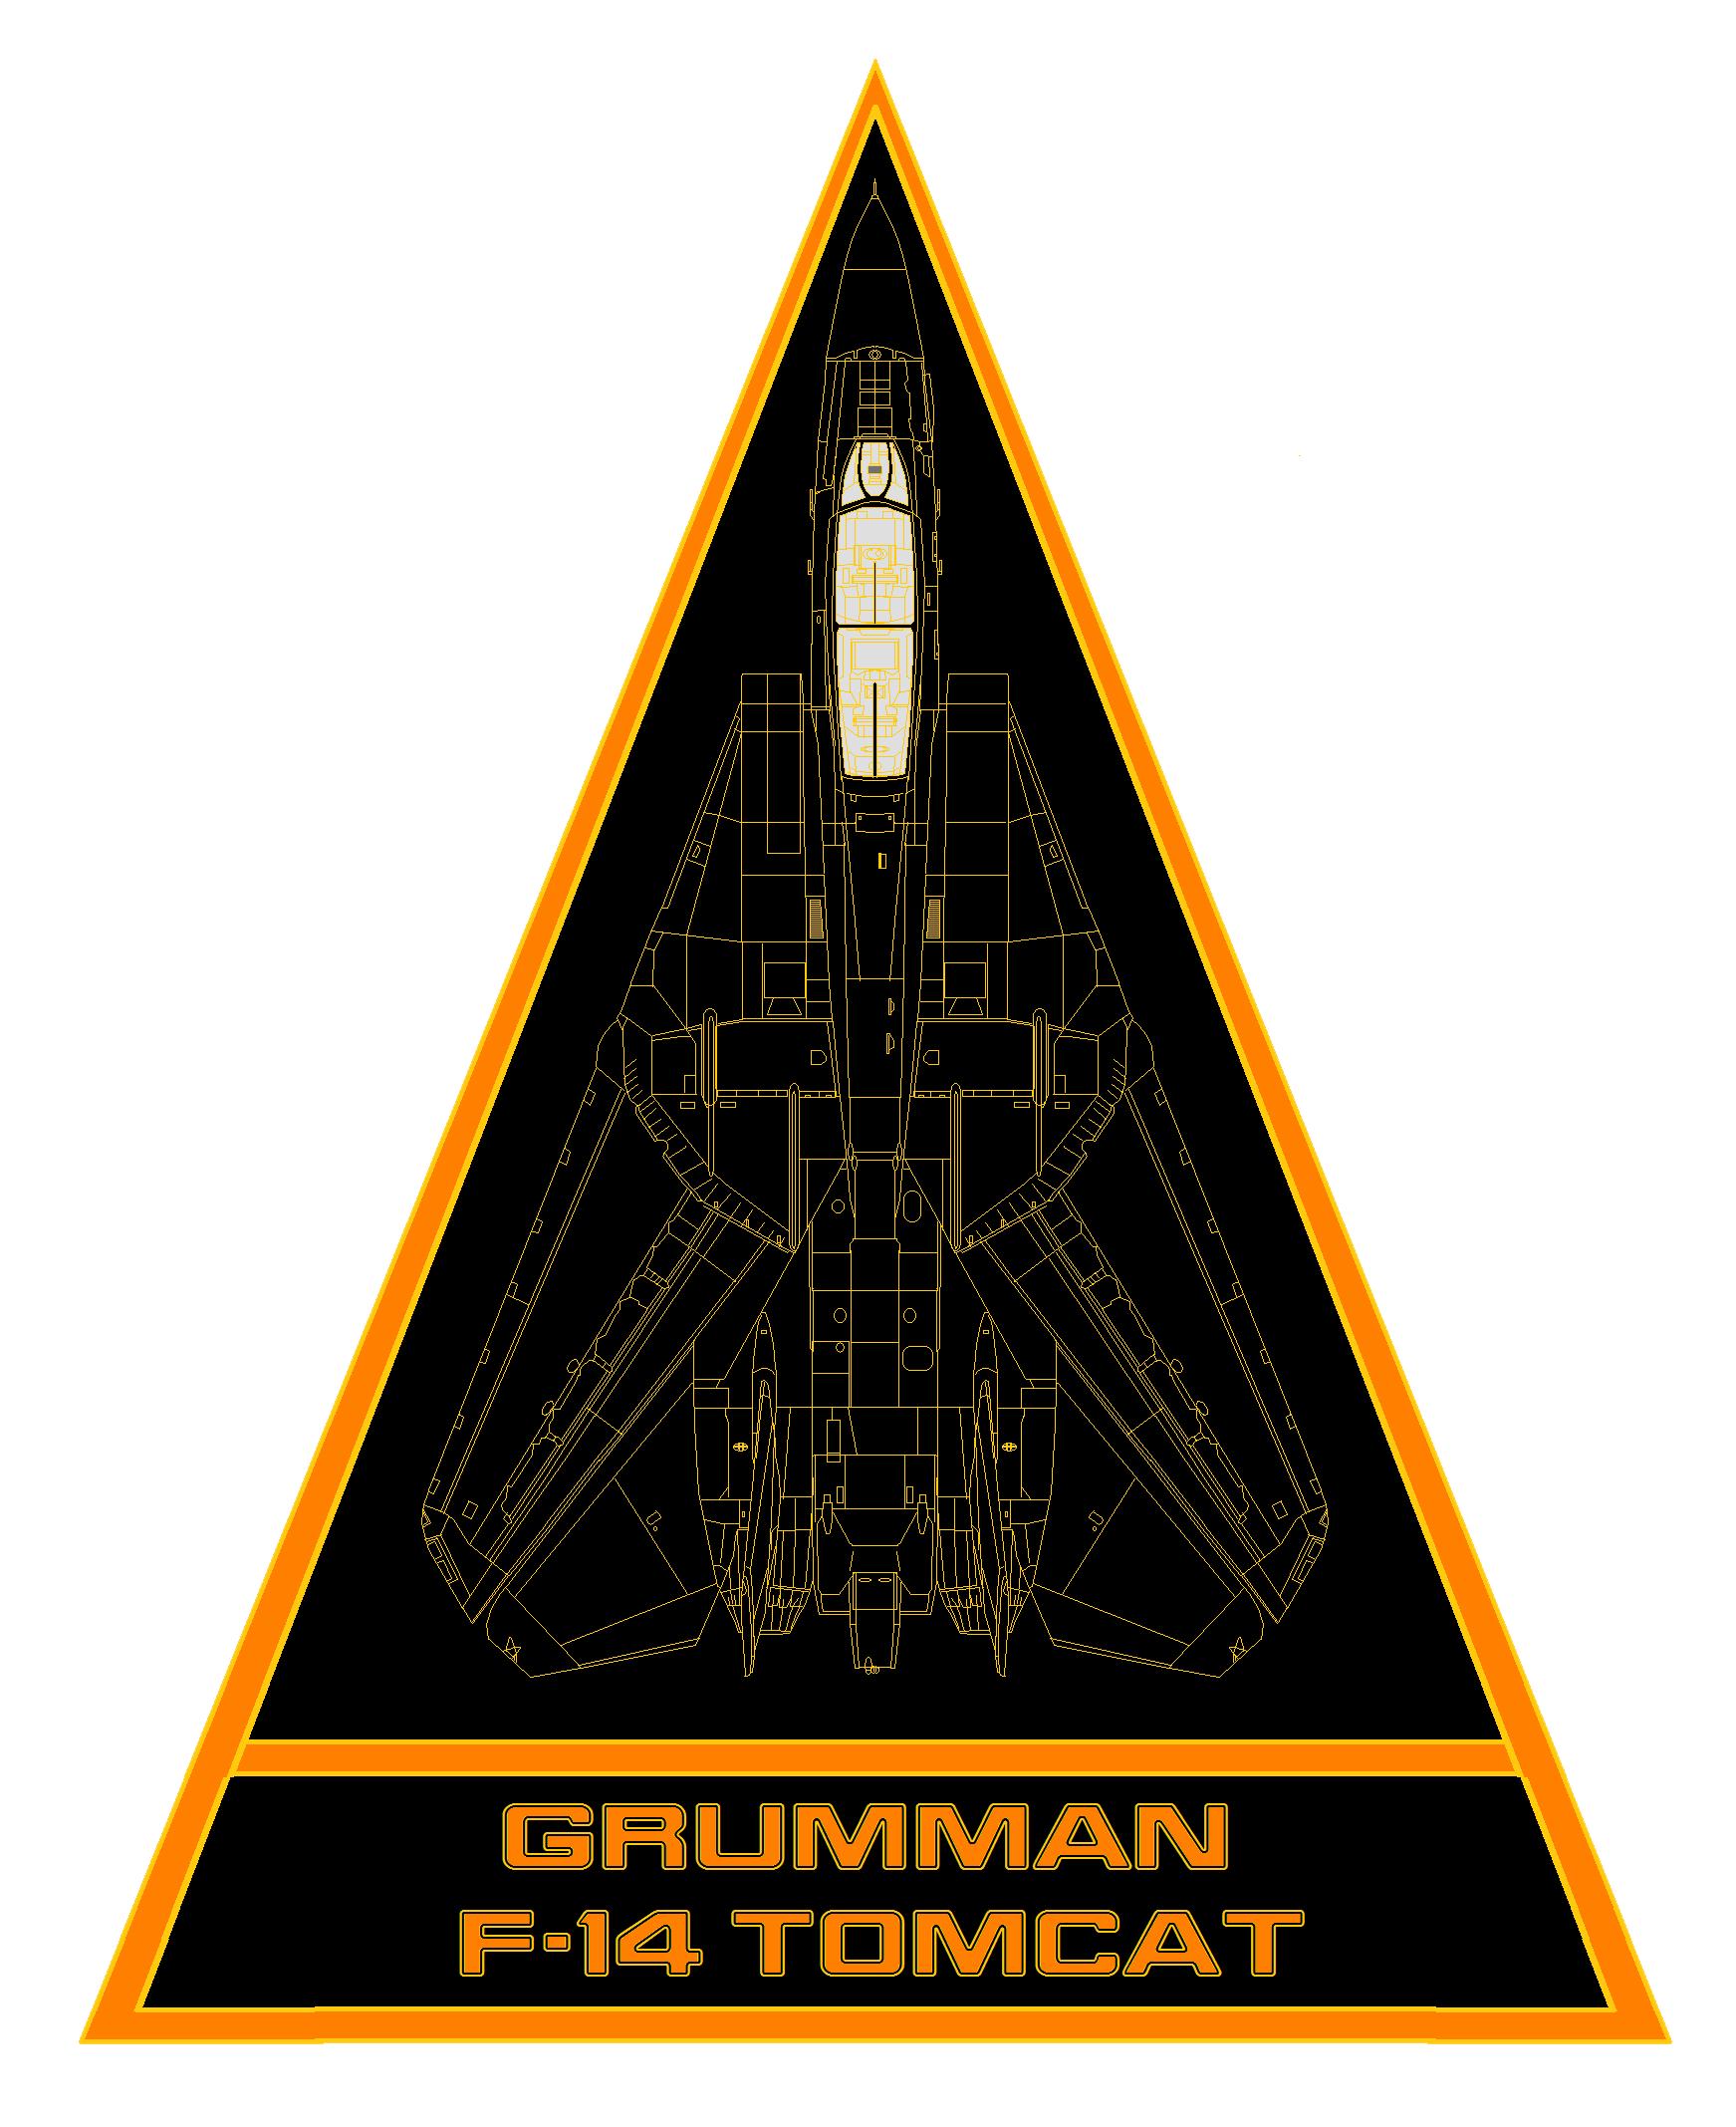 Grumman F-14 Tomcat patch by bagera3005